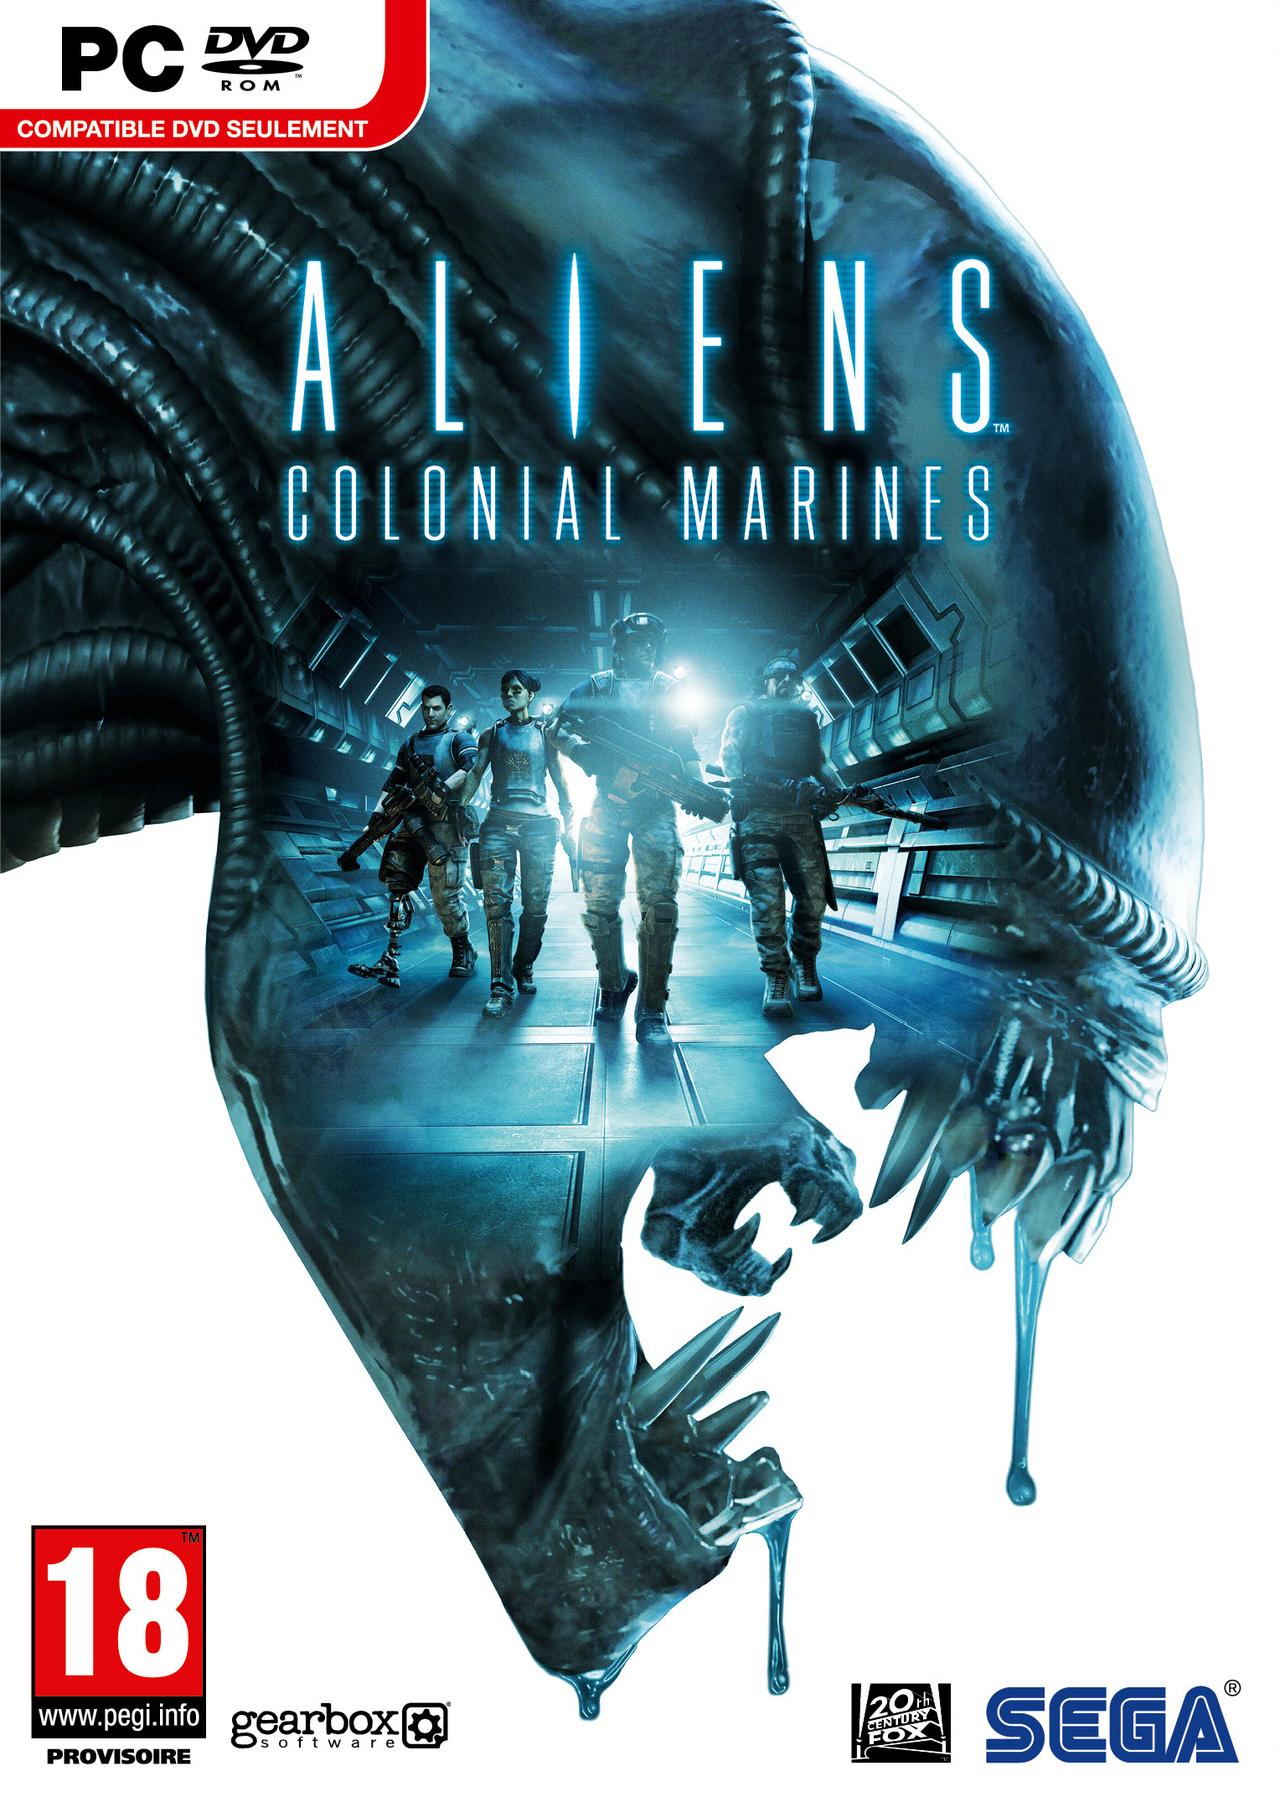 Aliens : Colonial Marines (2013) [REPACK Black Box]